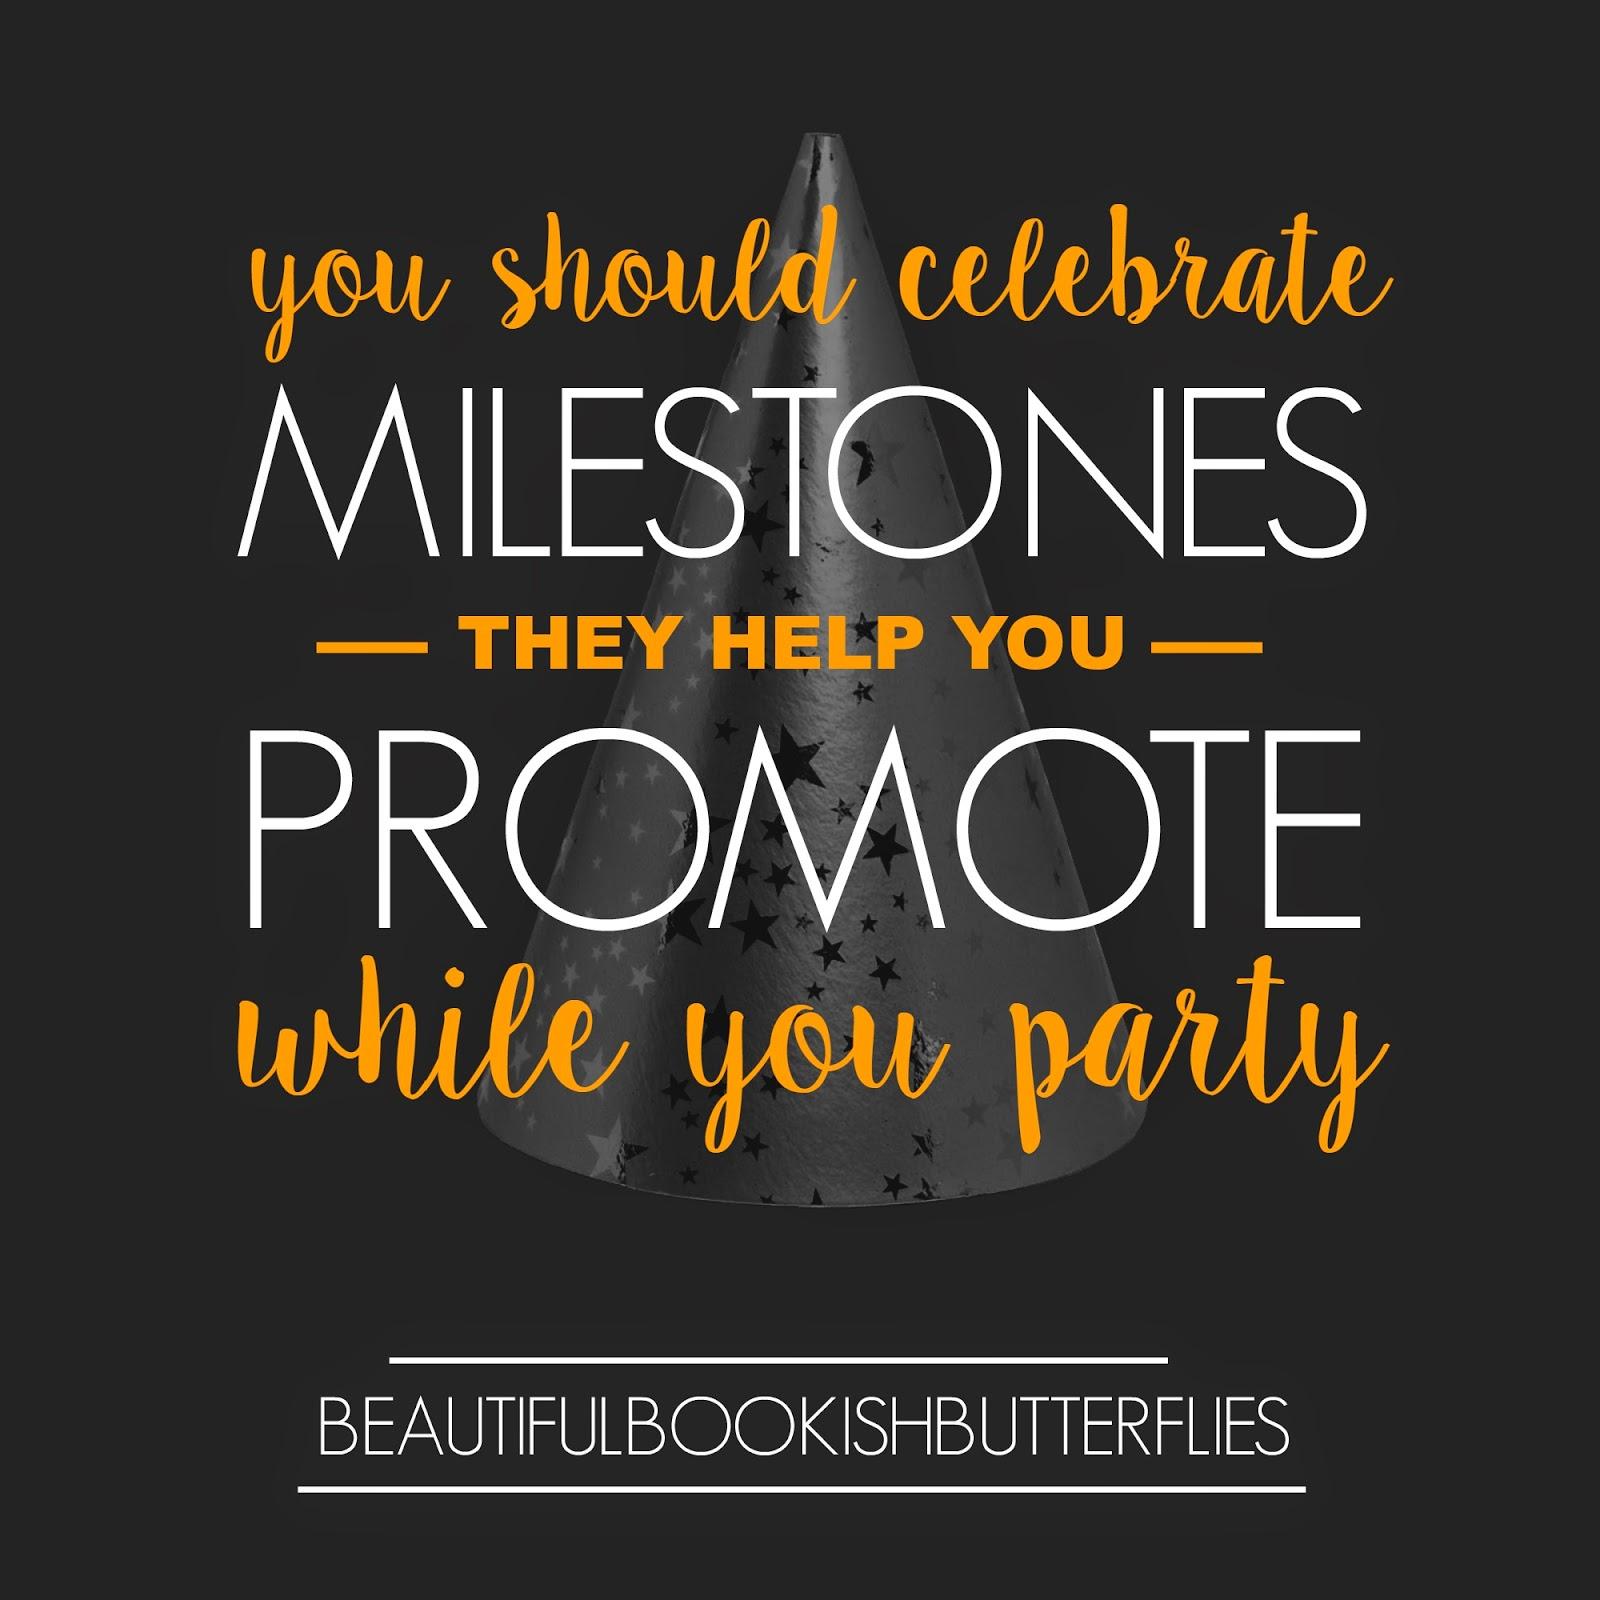 You Should Celebrate Blogging Milestones